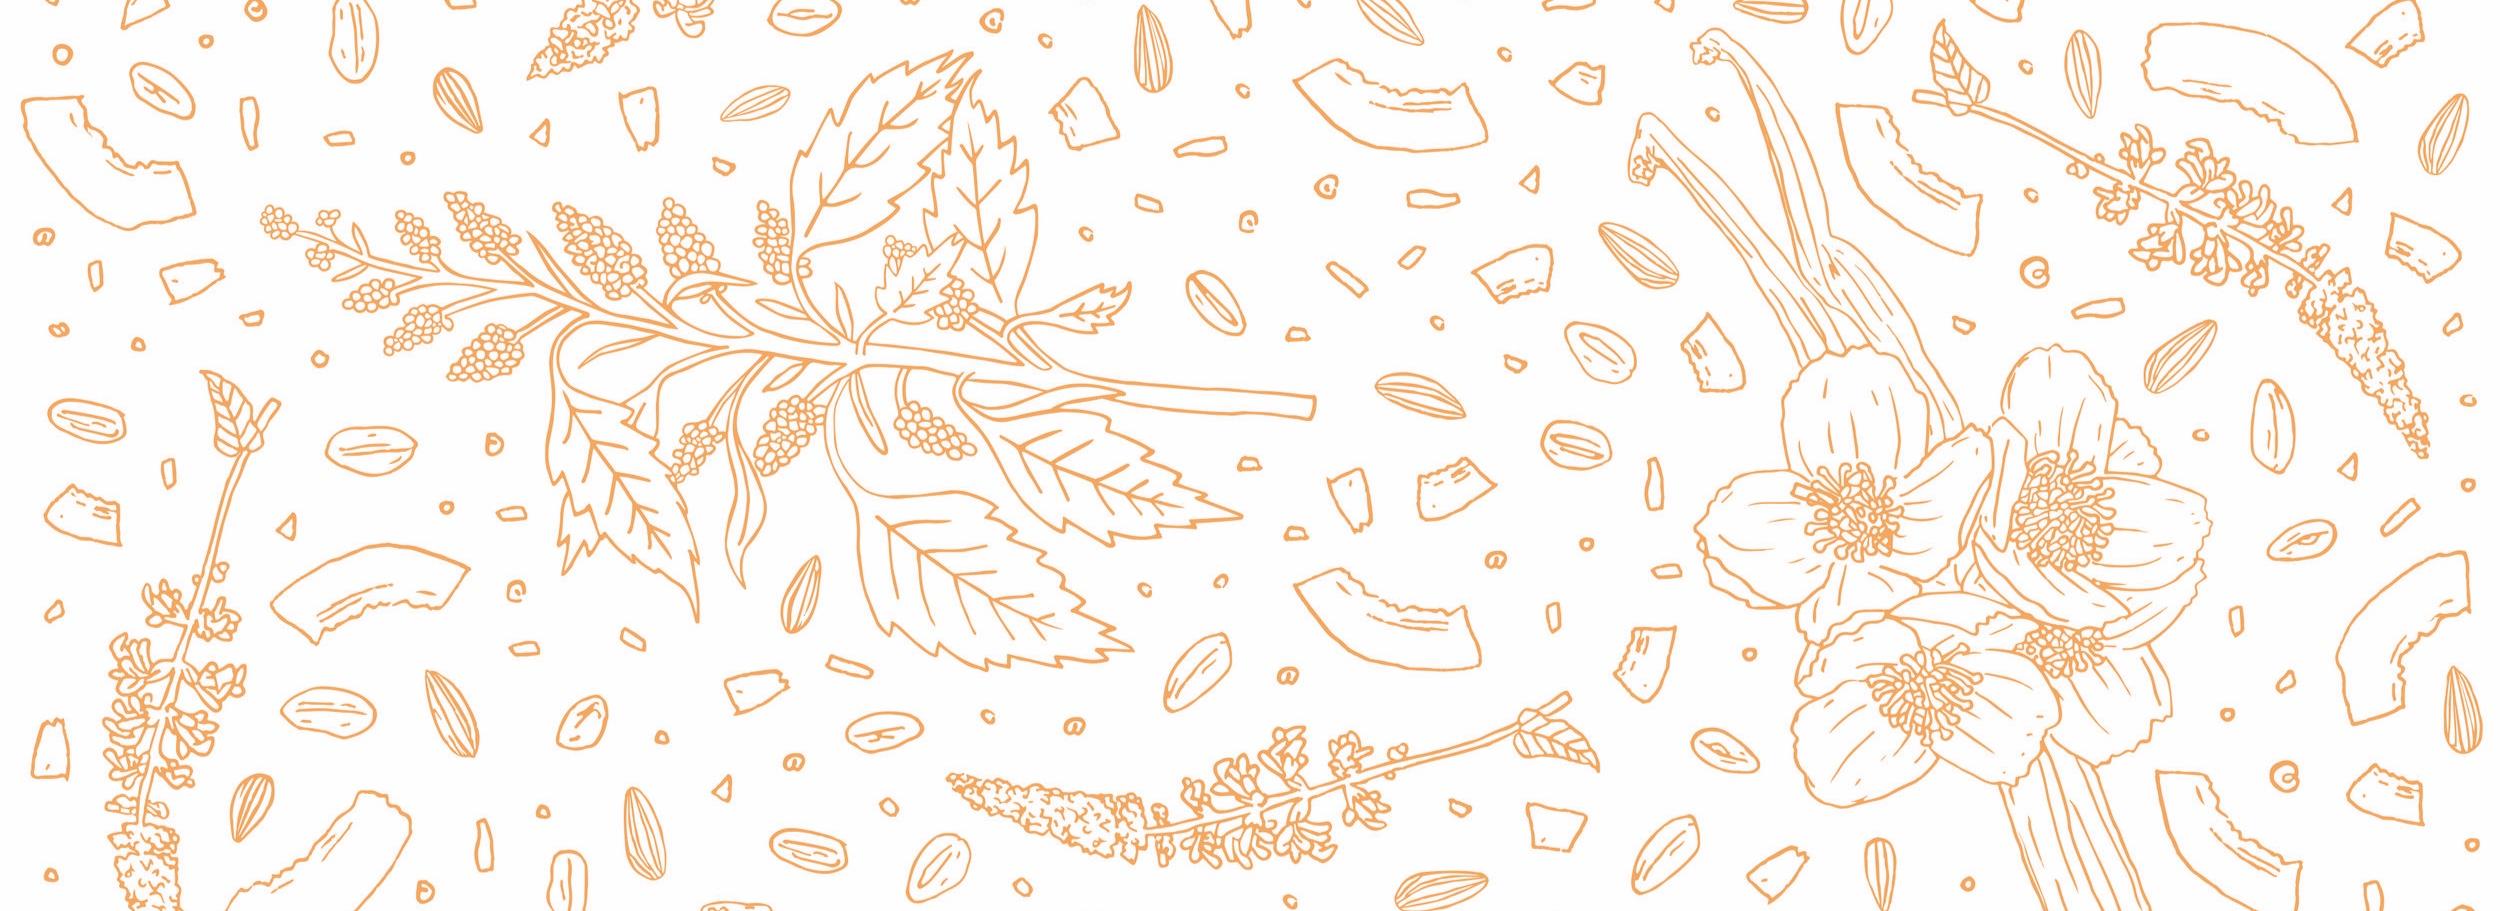 Qnola-Oat-Crunch_Quinoa_Cereal_Packaging-Design_Illustration.jpg